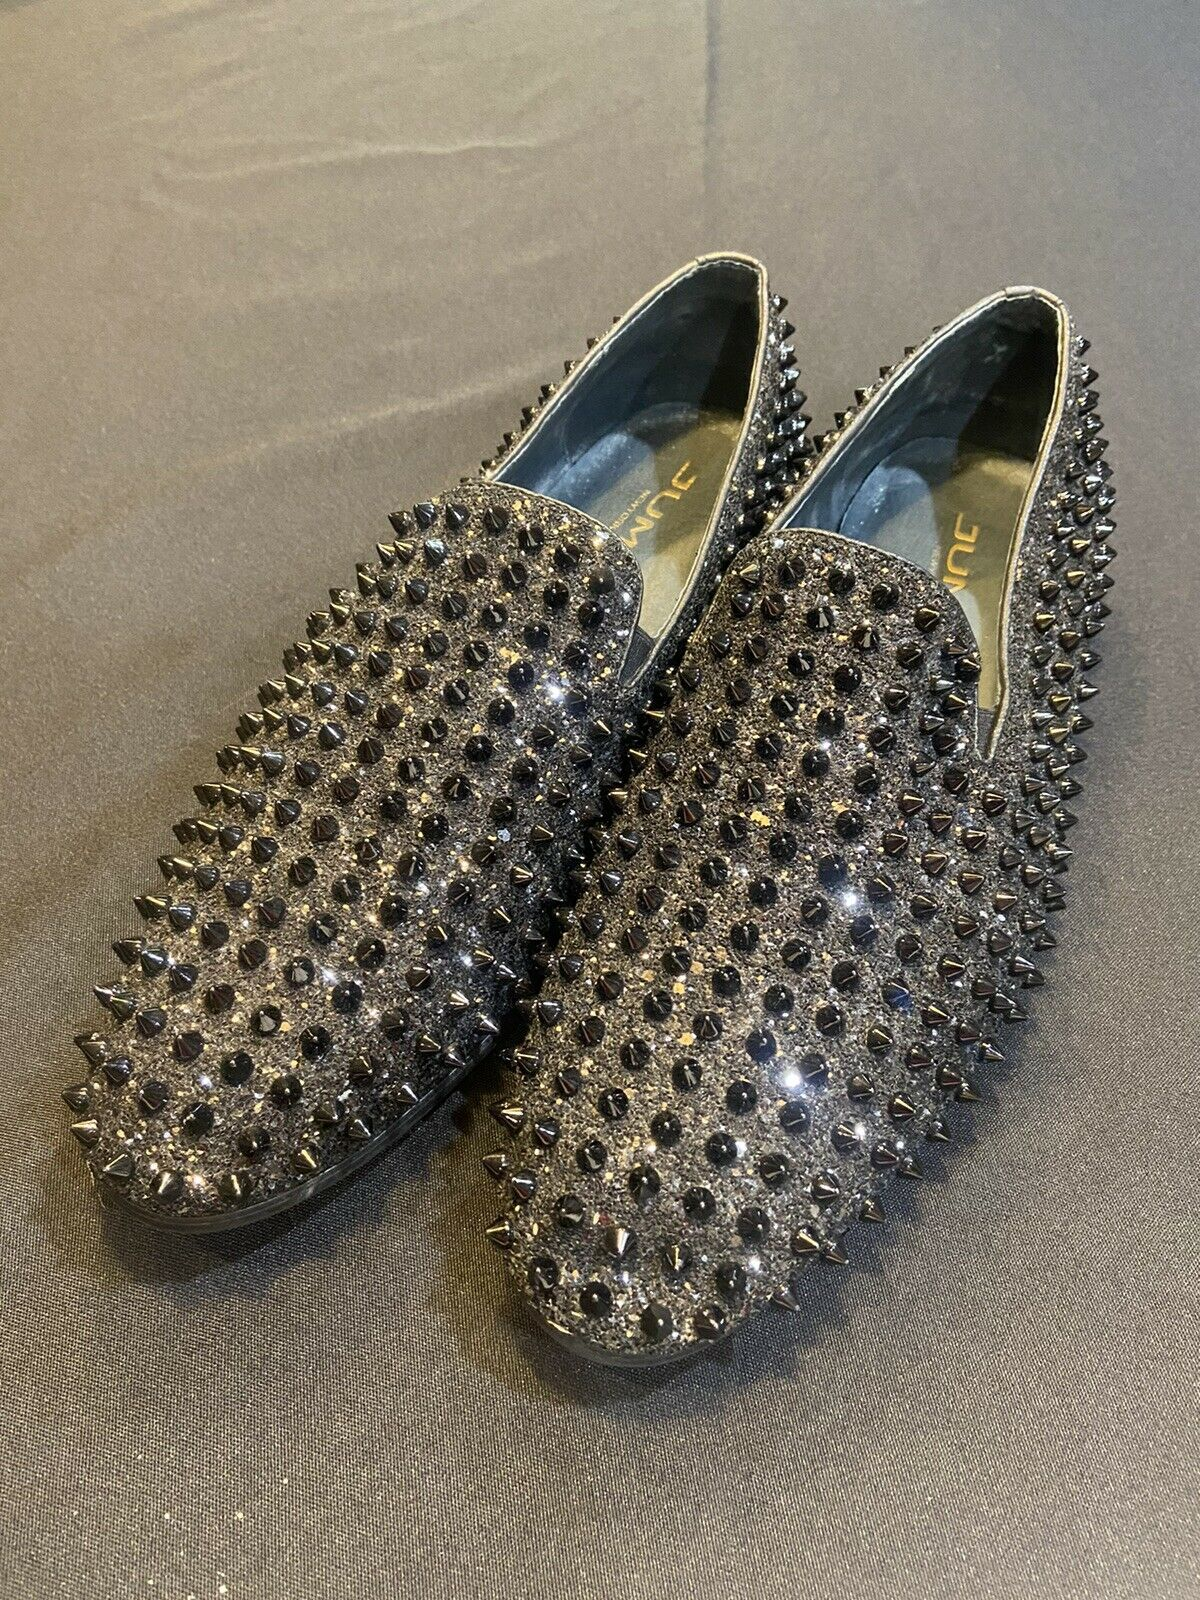 Jump NewYork Shoe/Dress Loafer-Men Sz.12-Black/Spikes/Glitter